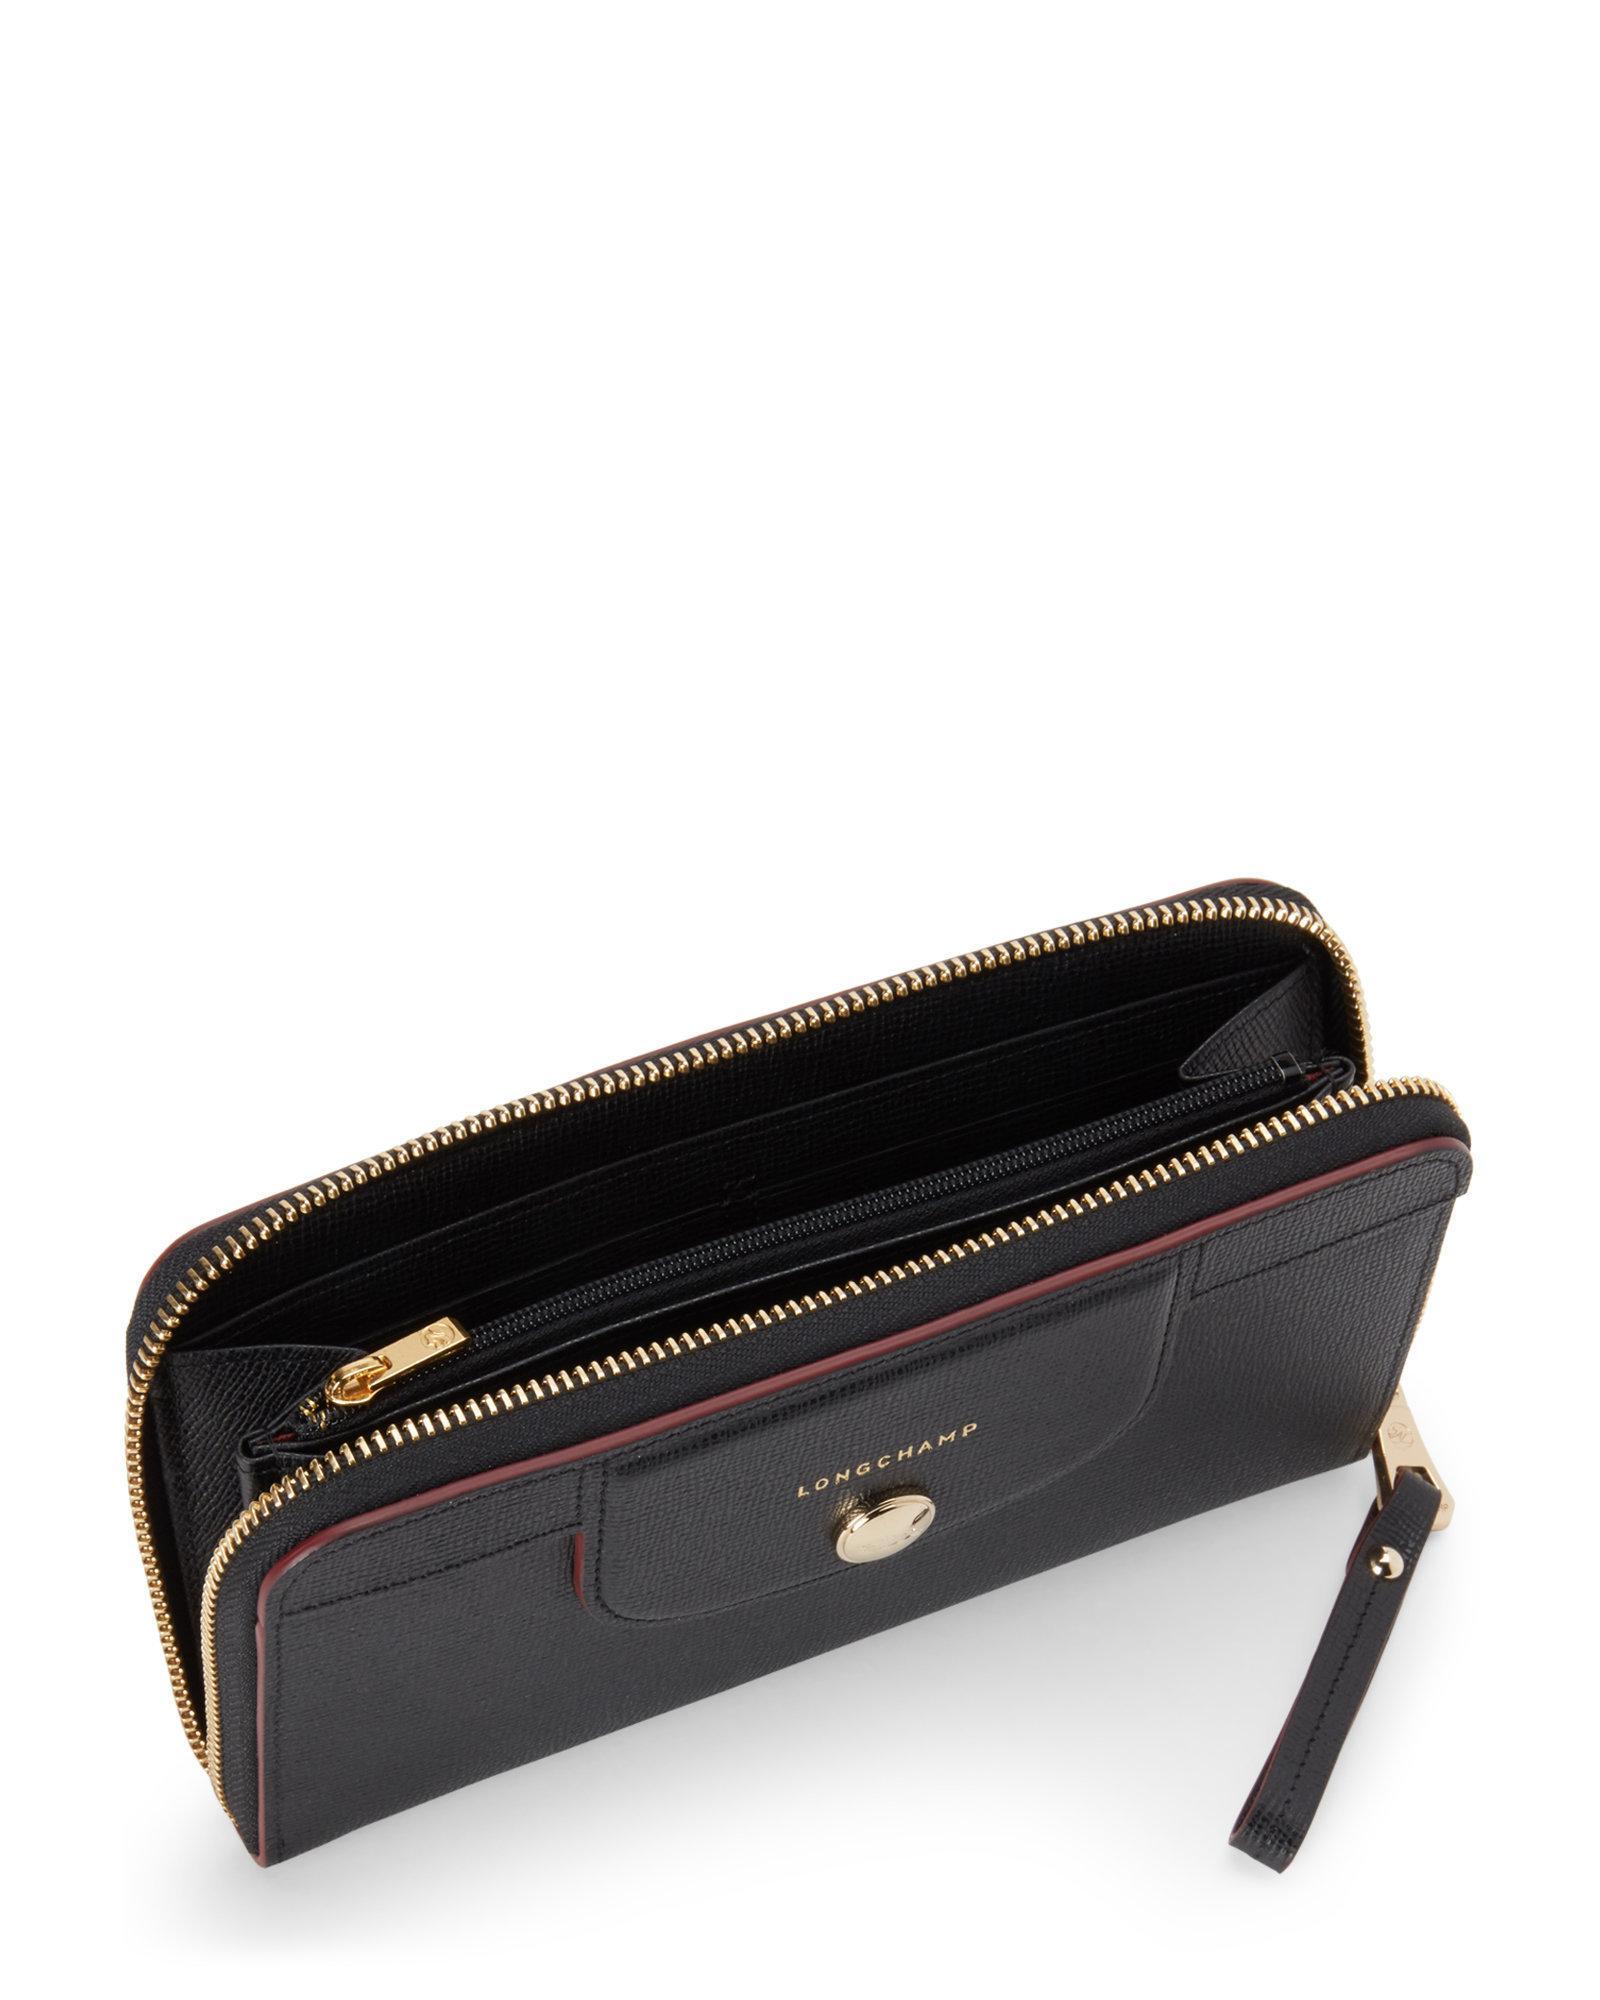 all around zip wallet - Black Longchamp 8wG7BChQ